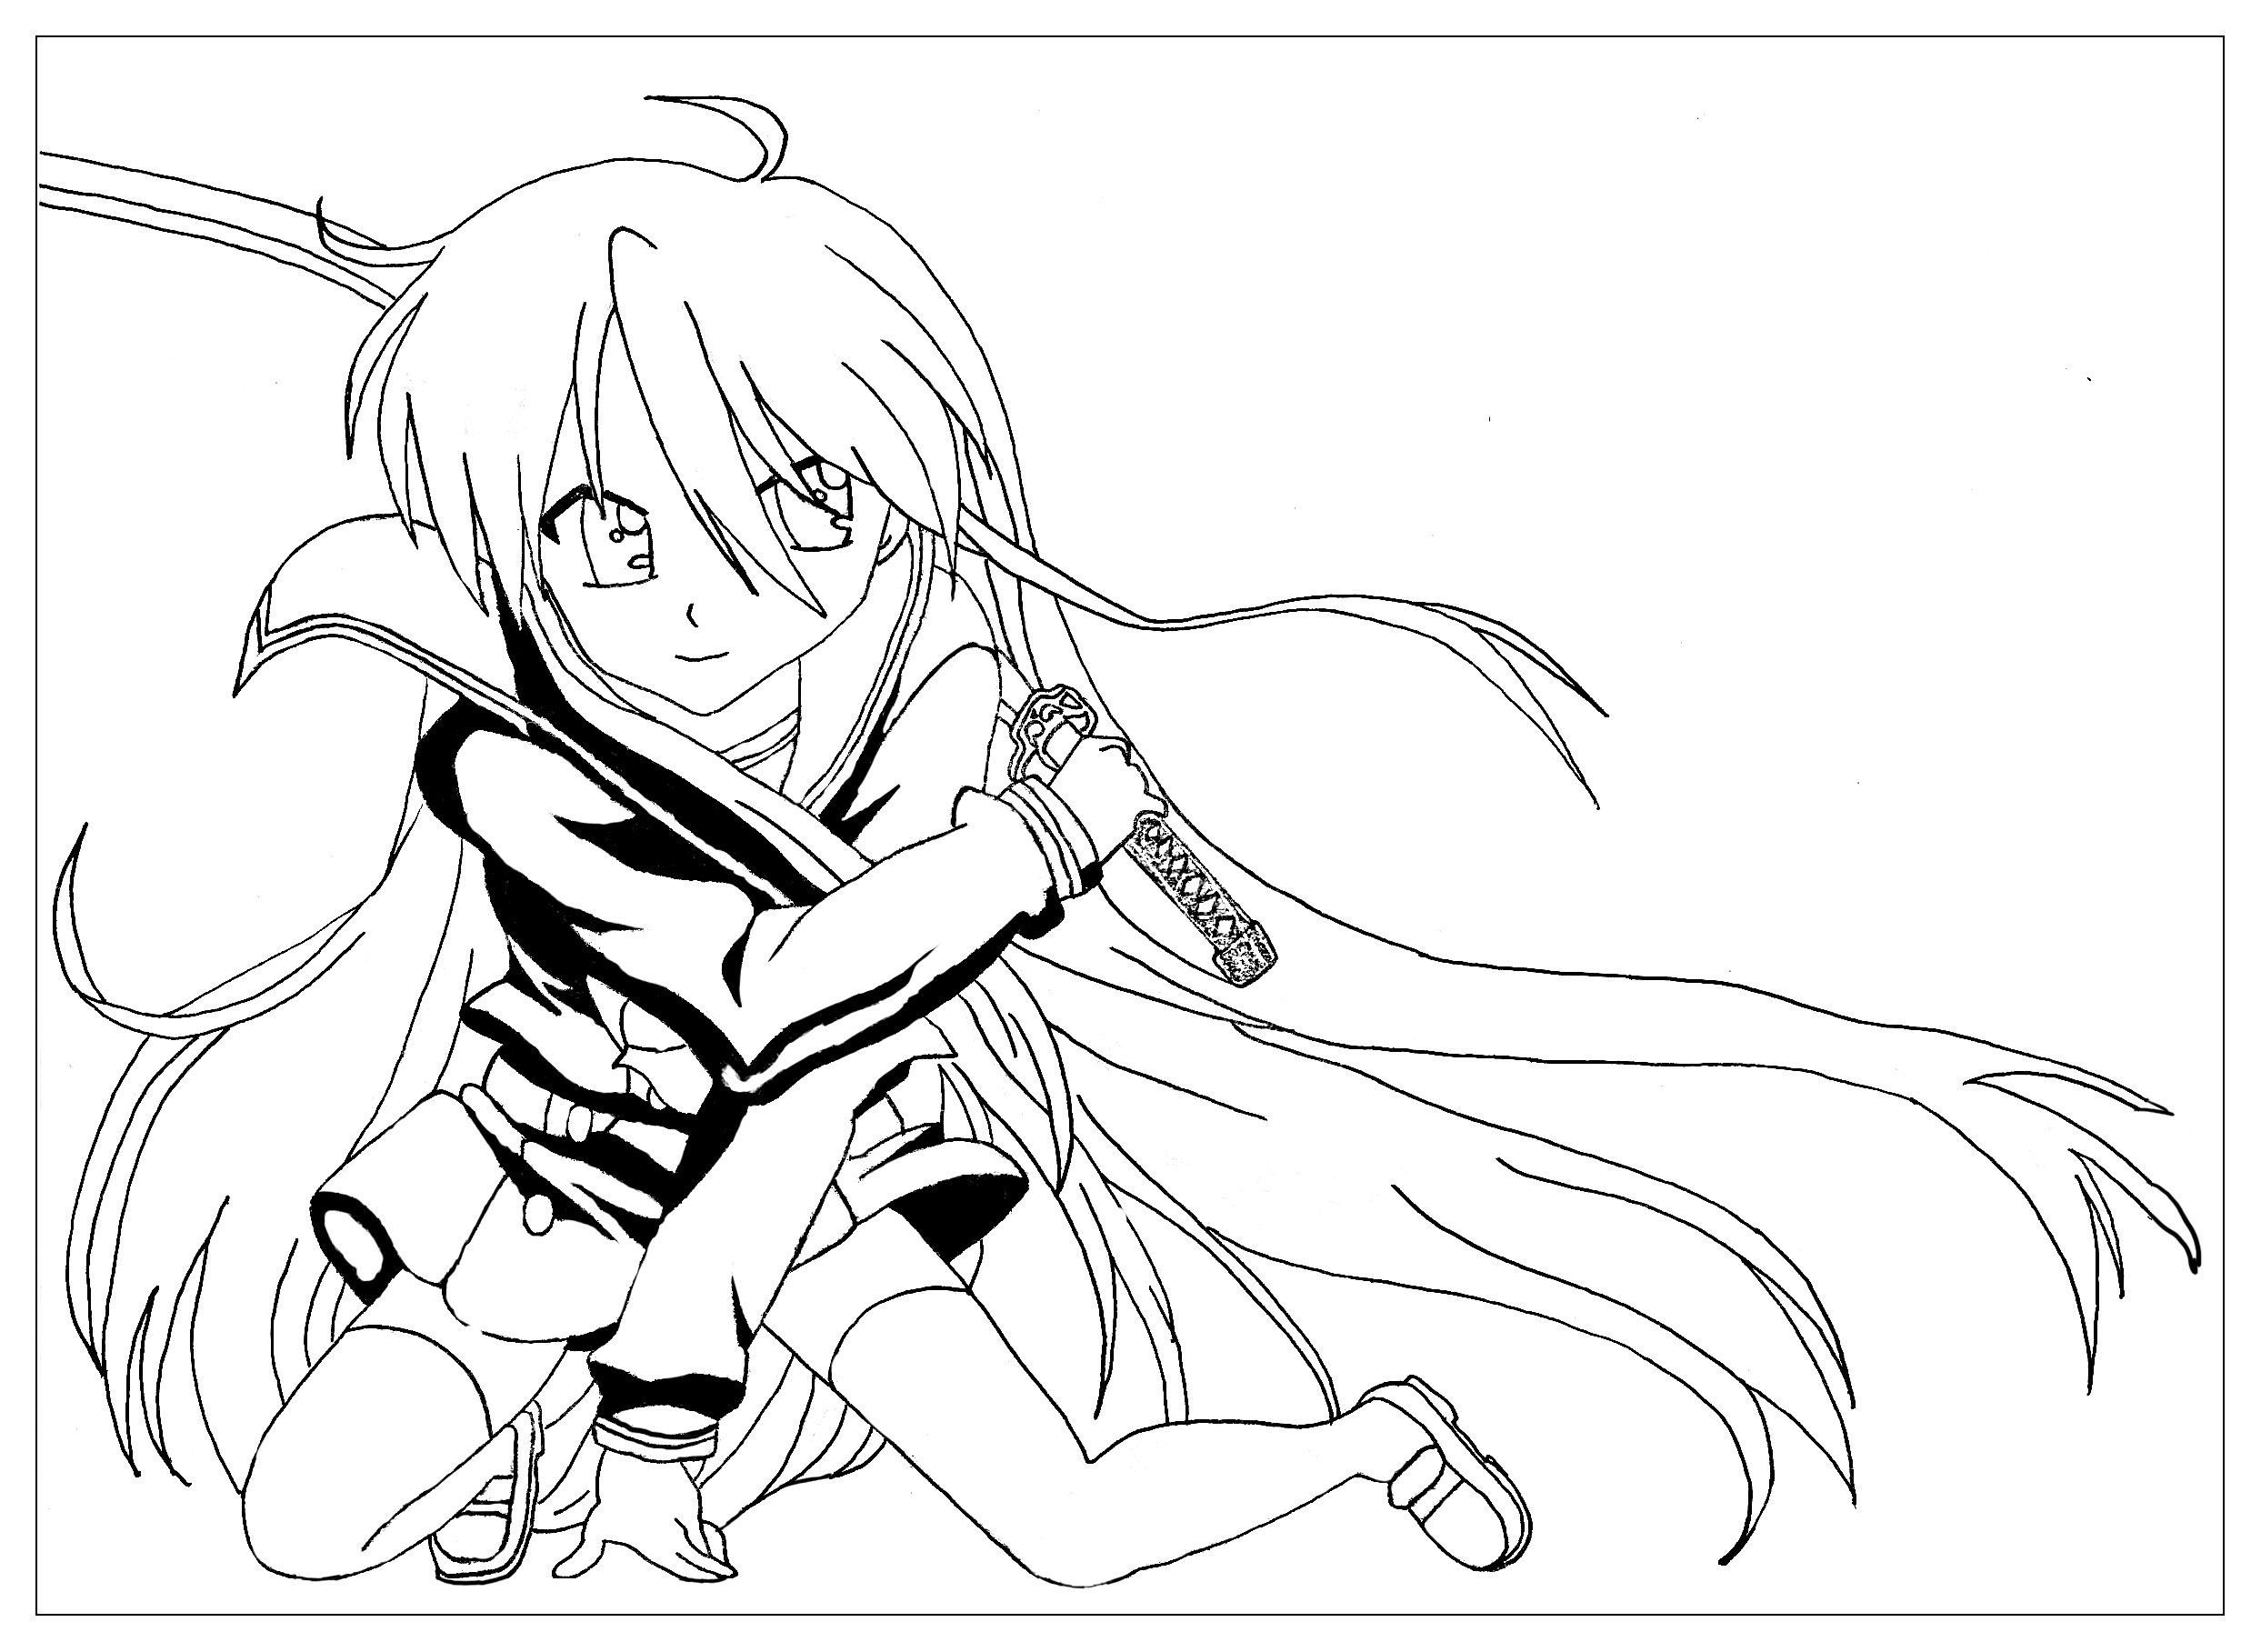 La Fille Au Sabre Style Manga Krissy - Mangas - Coloriages pour Coloriage Manga Kawaii